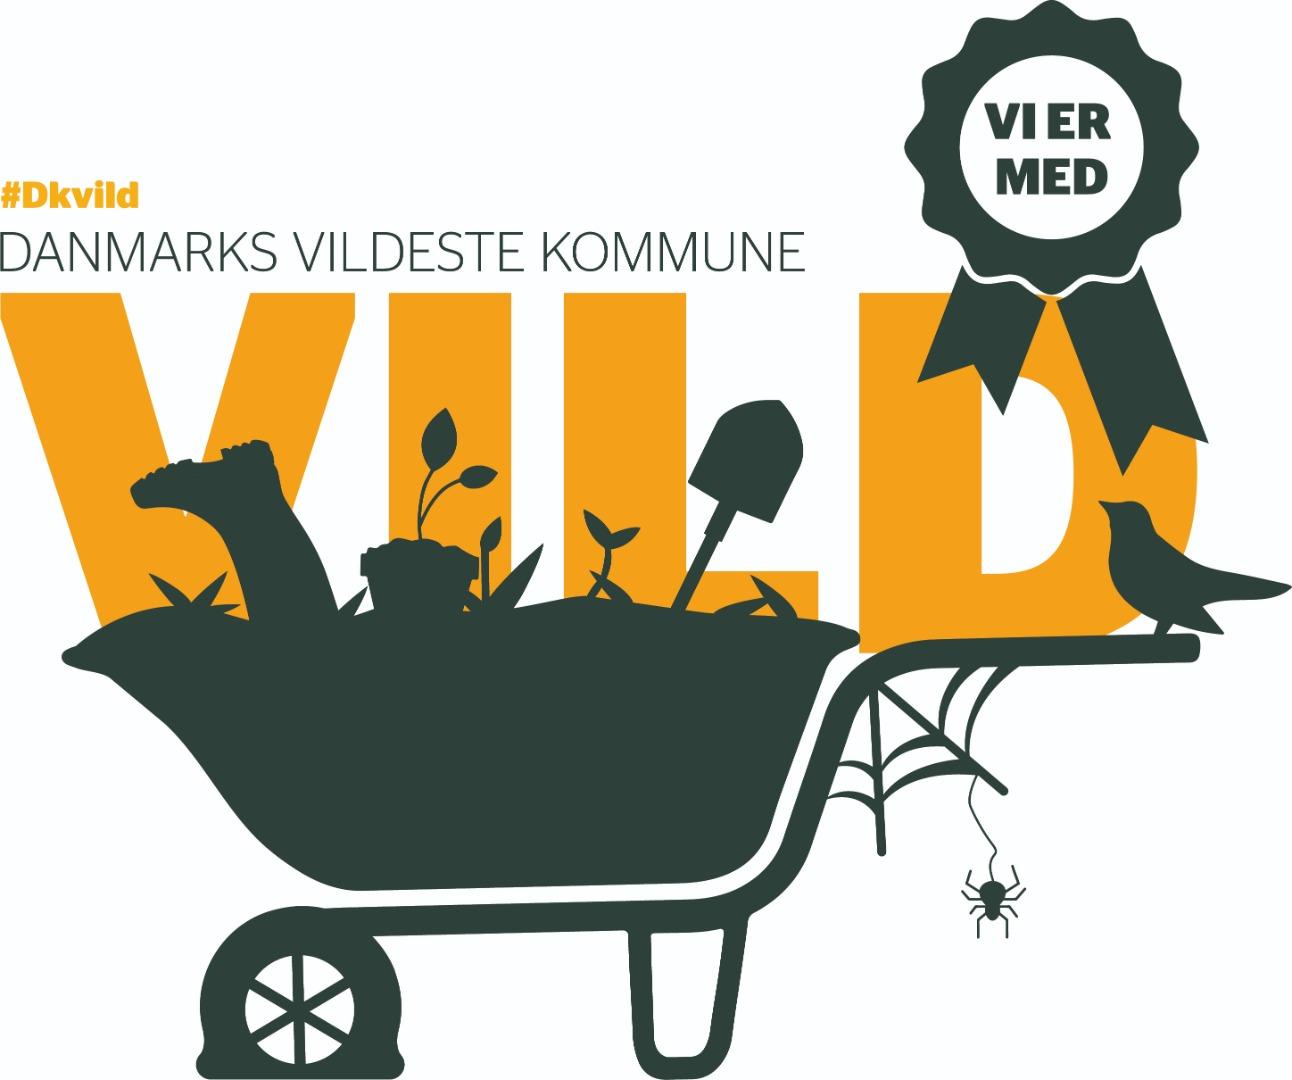 Holbæk har tilmeldt sig 'Danmarks VILDESTE kommune'